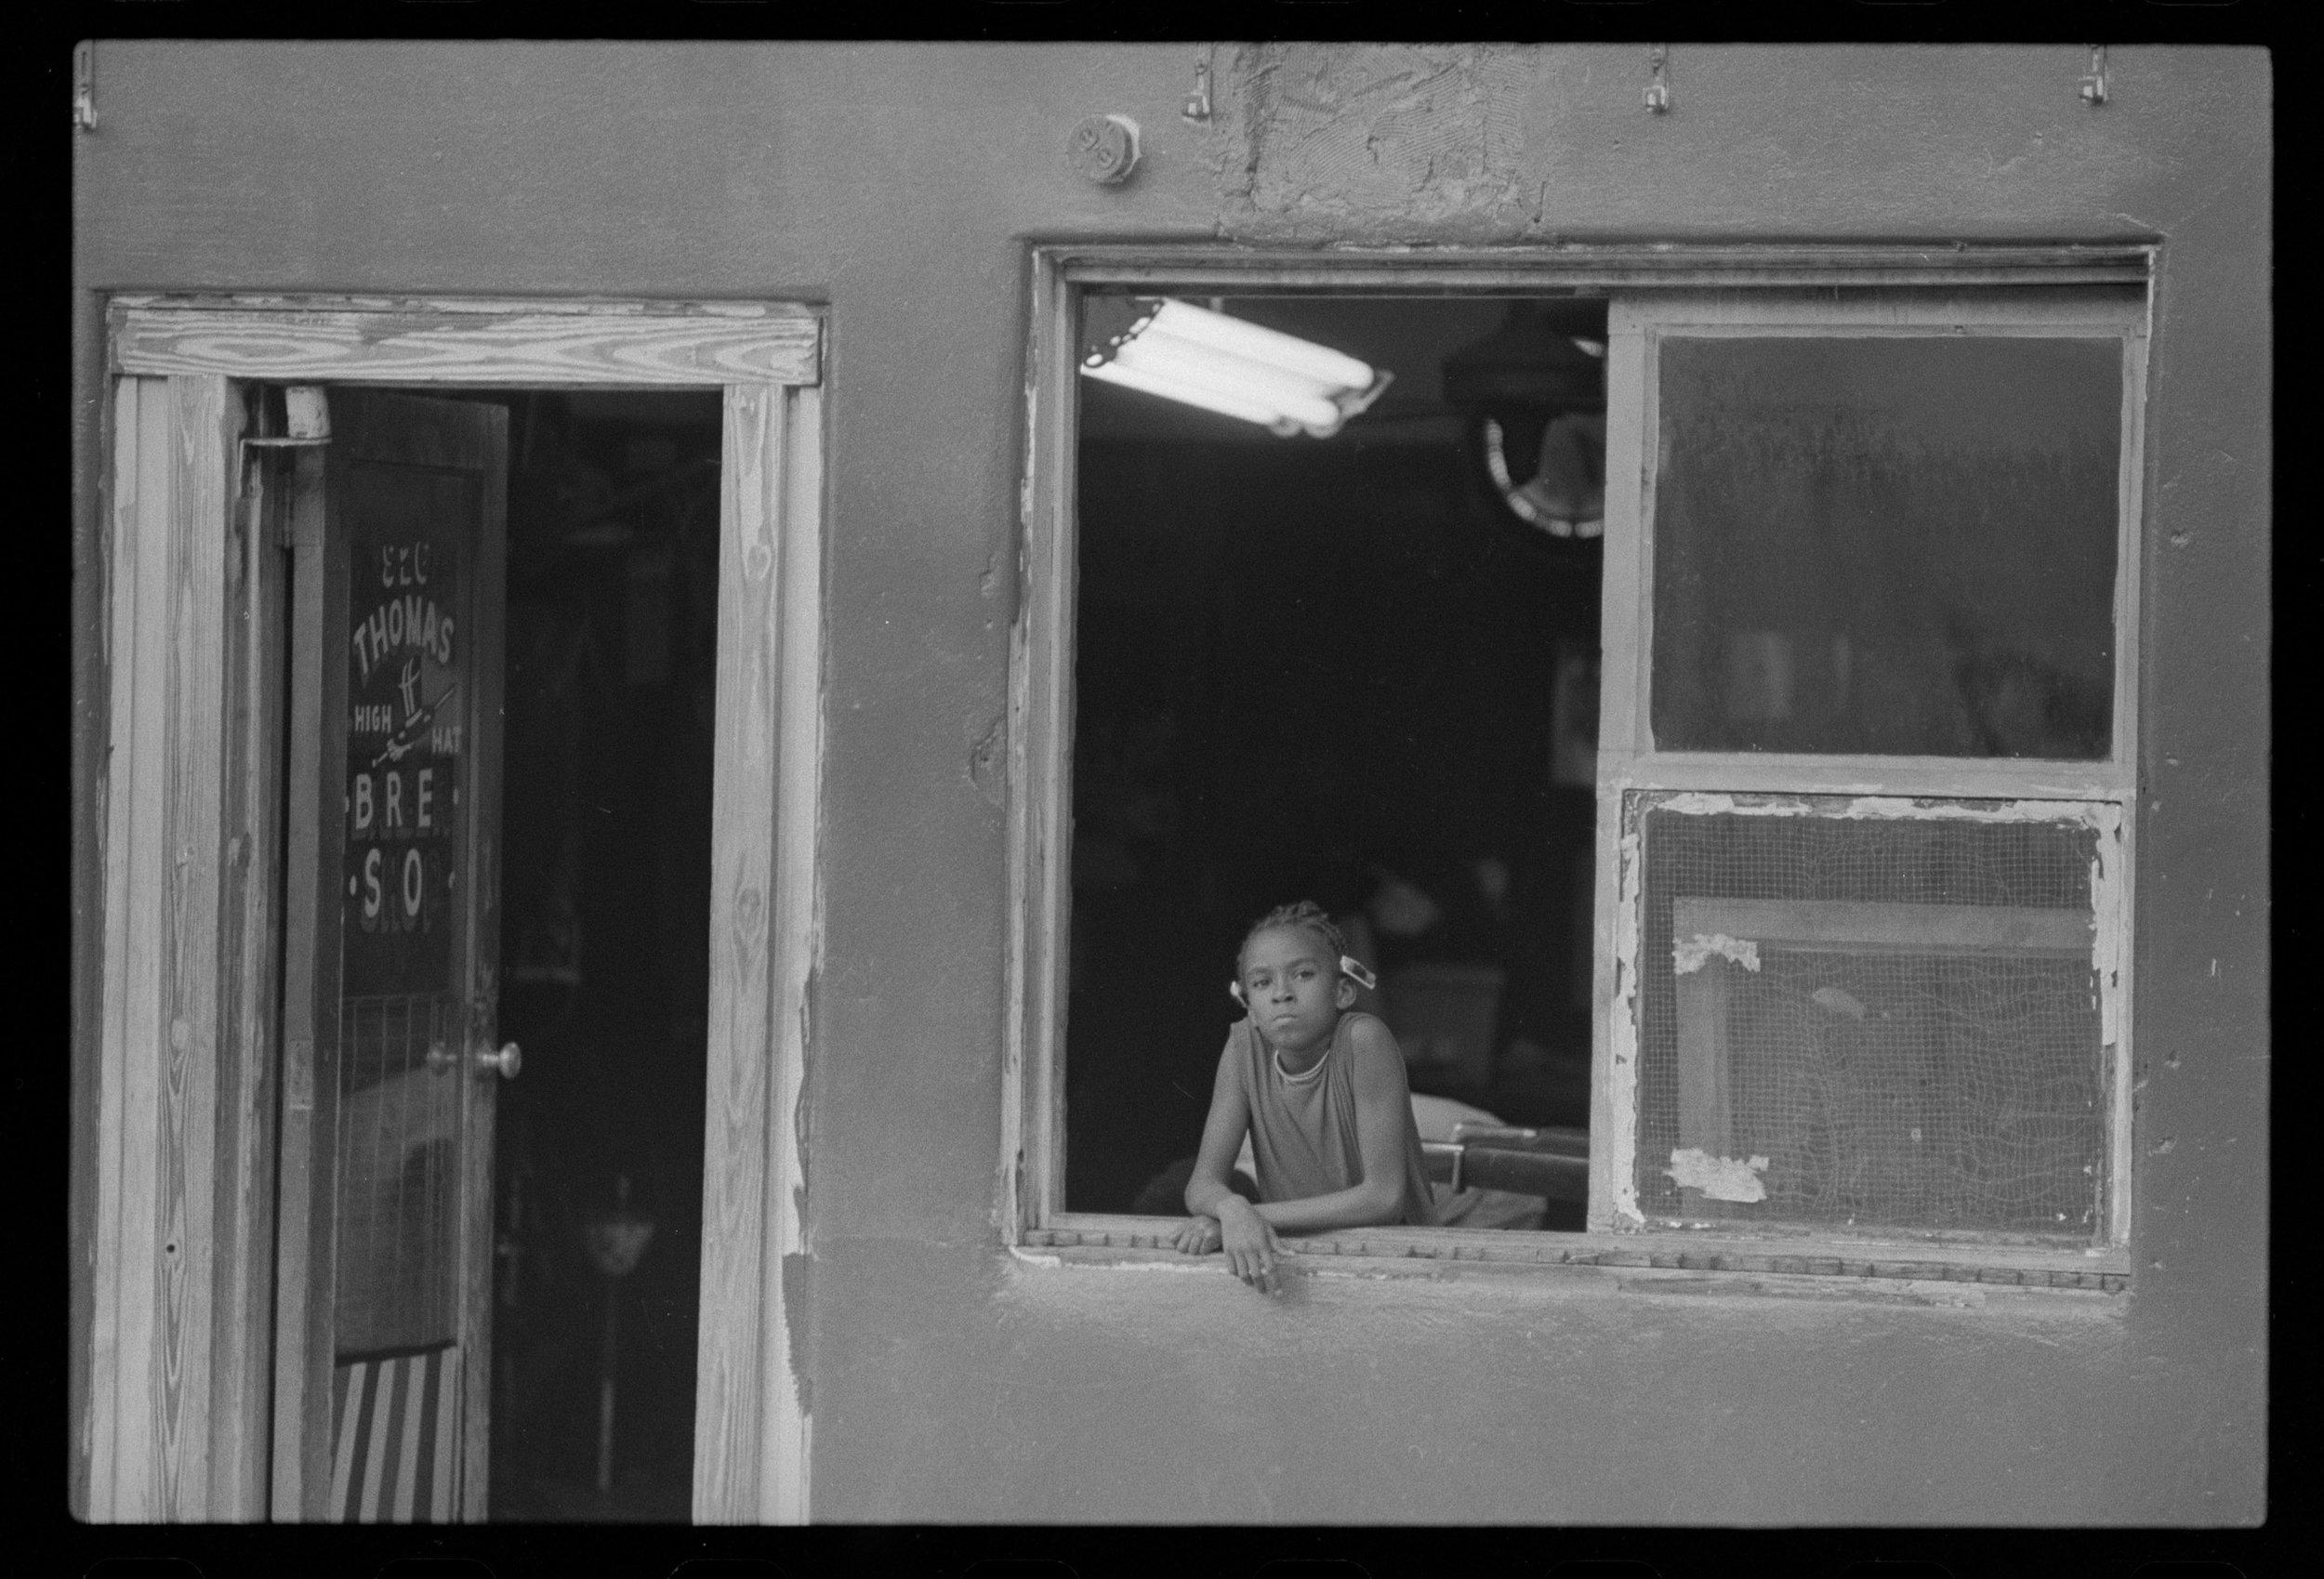 Ghetto_Girl_in_Window_062774_F23.jpg